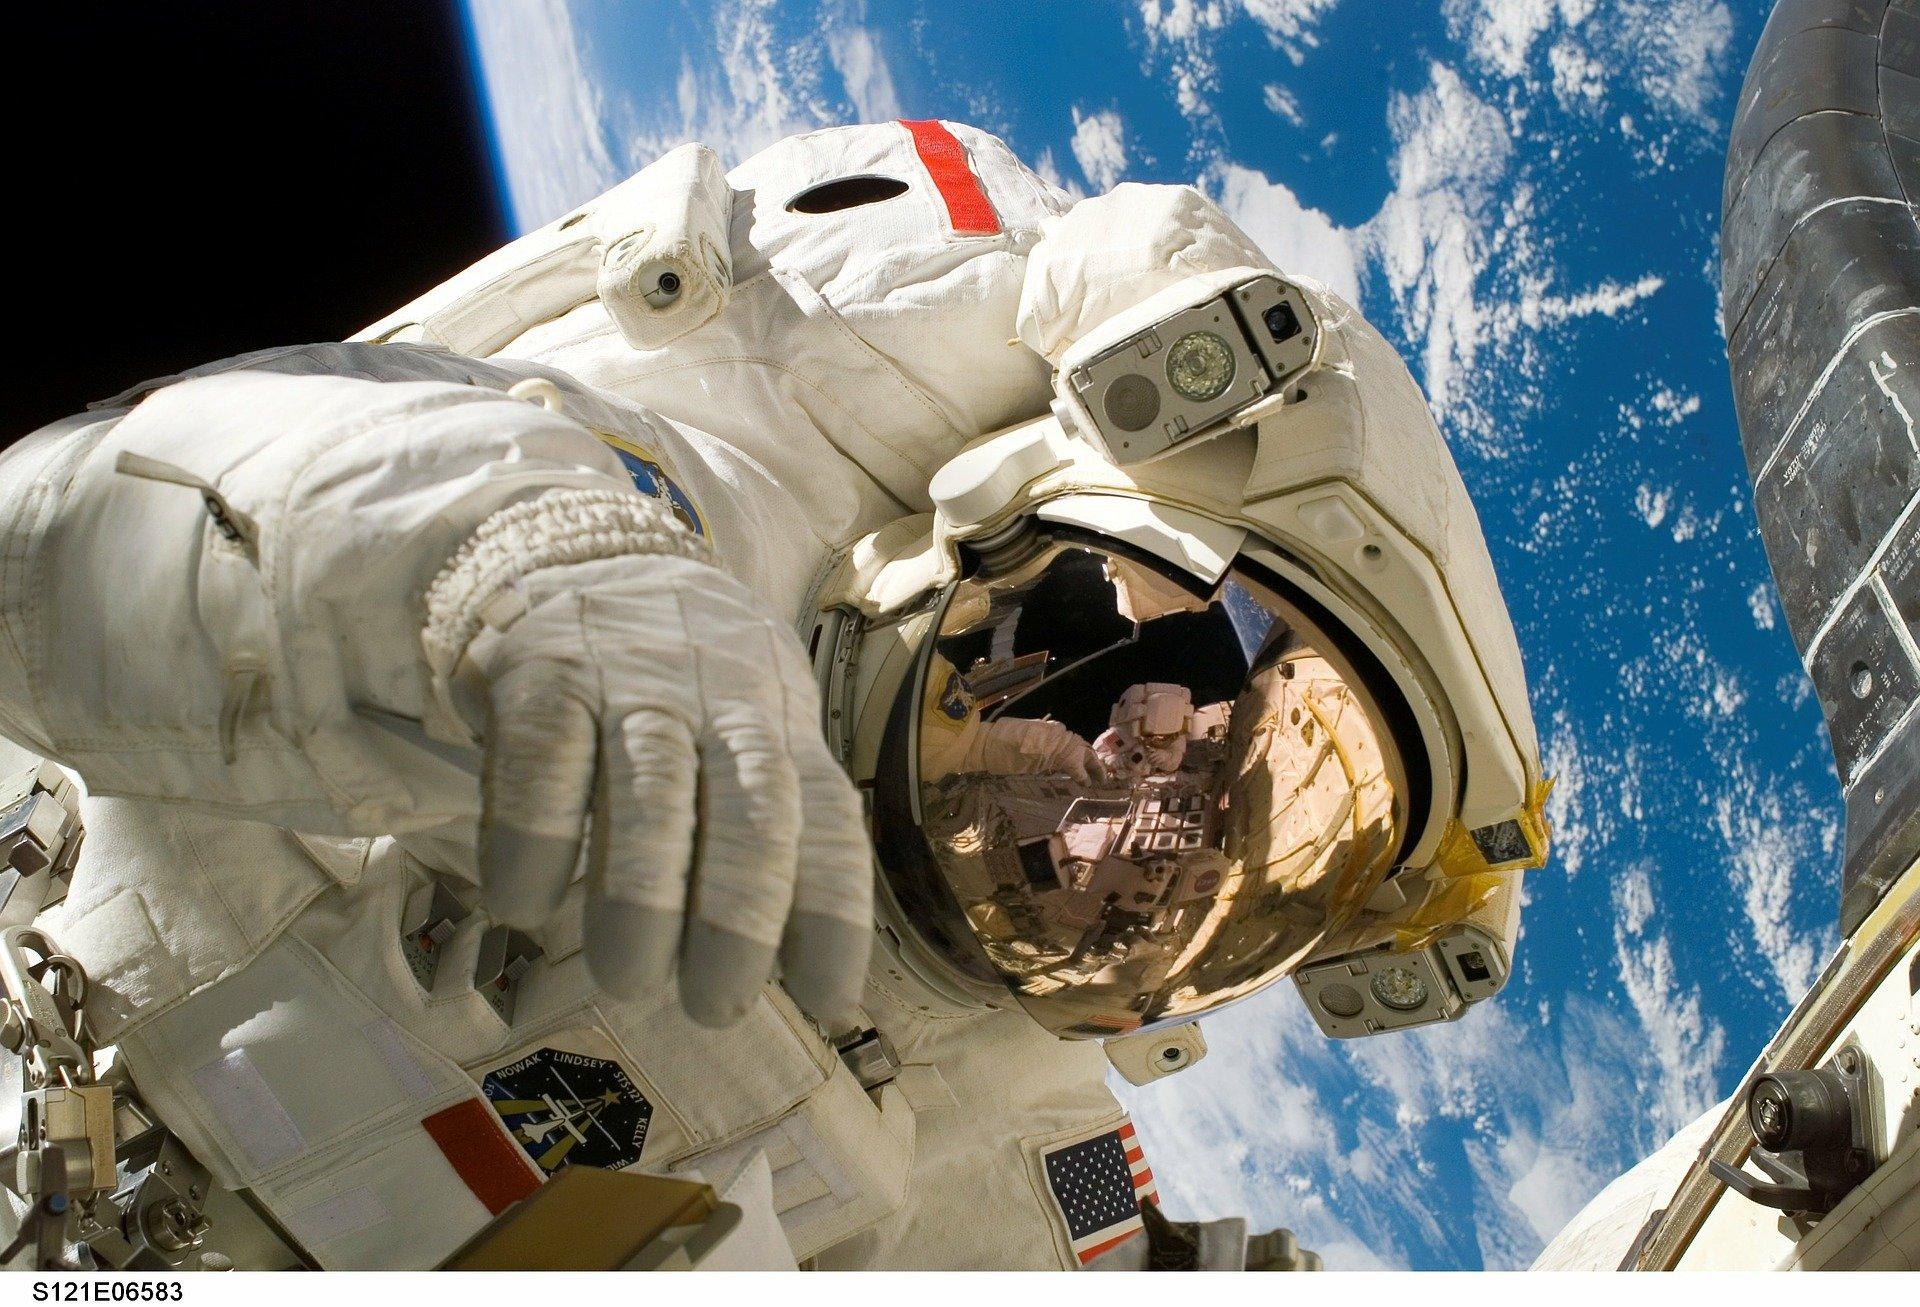 Space (NASA, Aerospace)